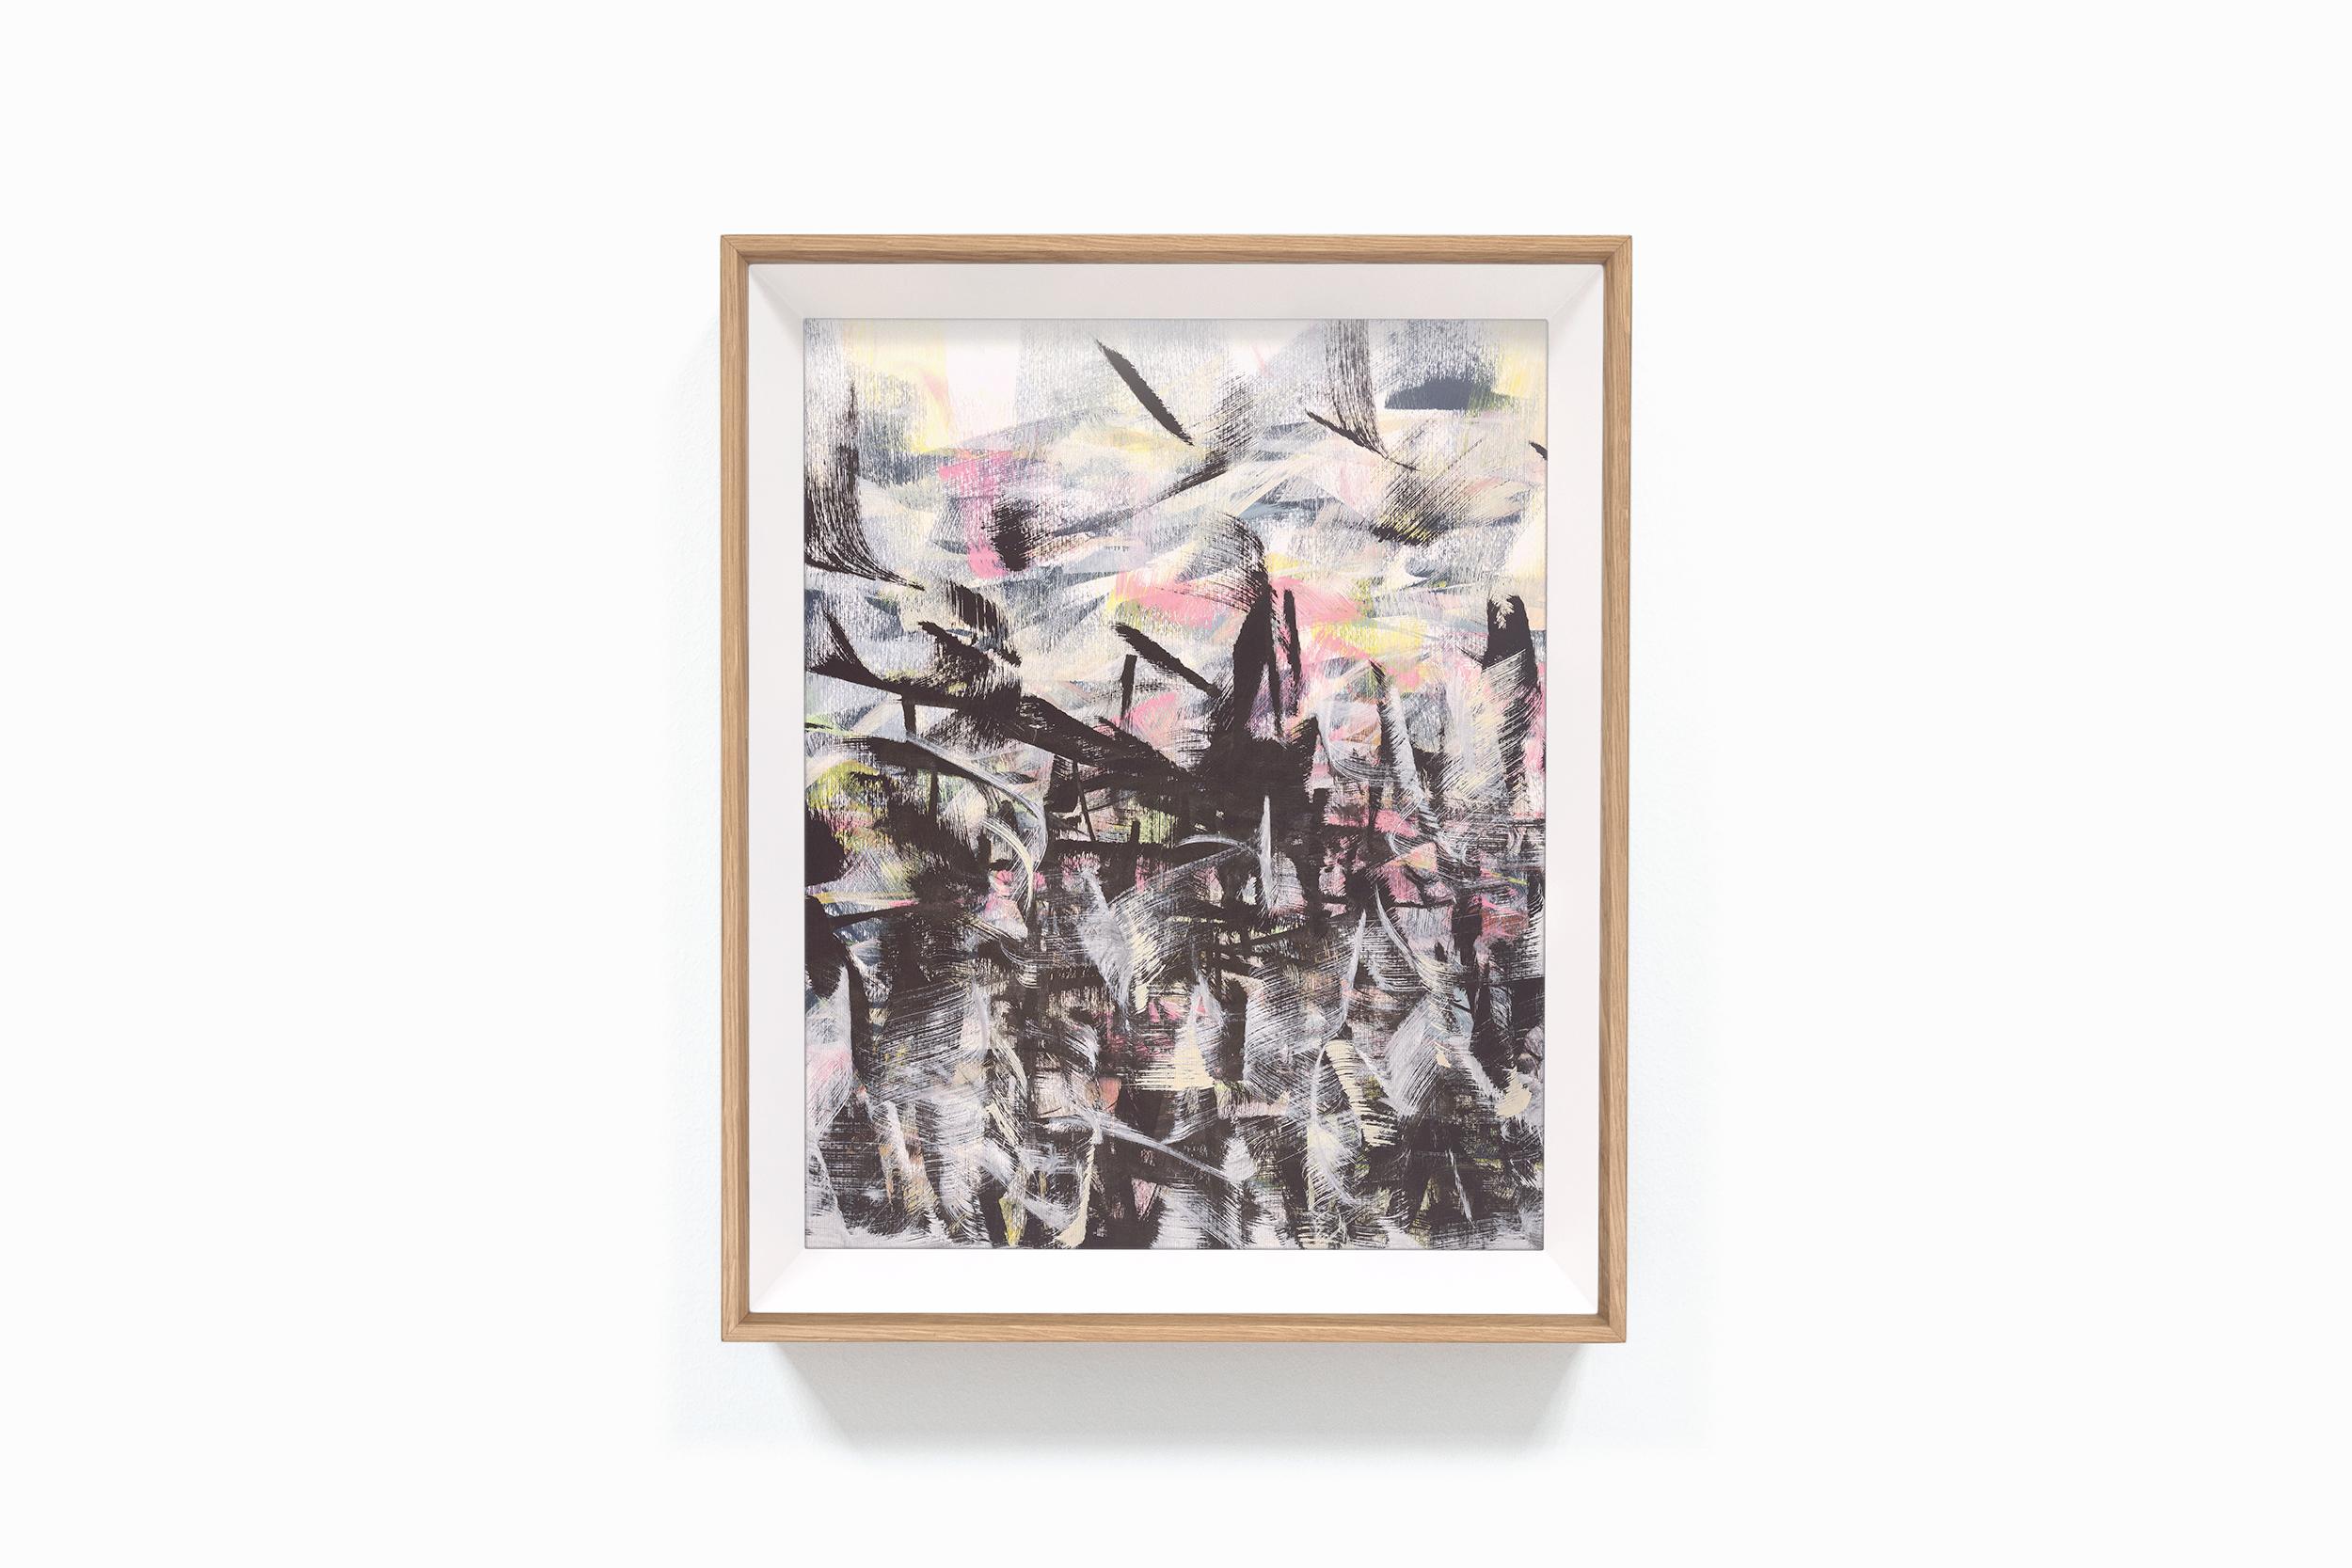 bonjourmolotov Deambulaia Exhibition 40x50 Illustration Ilustracao painting pintura acrylic acrílico canvas tela paper cardboard mdf Andre Gigante 23N4.jpg